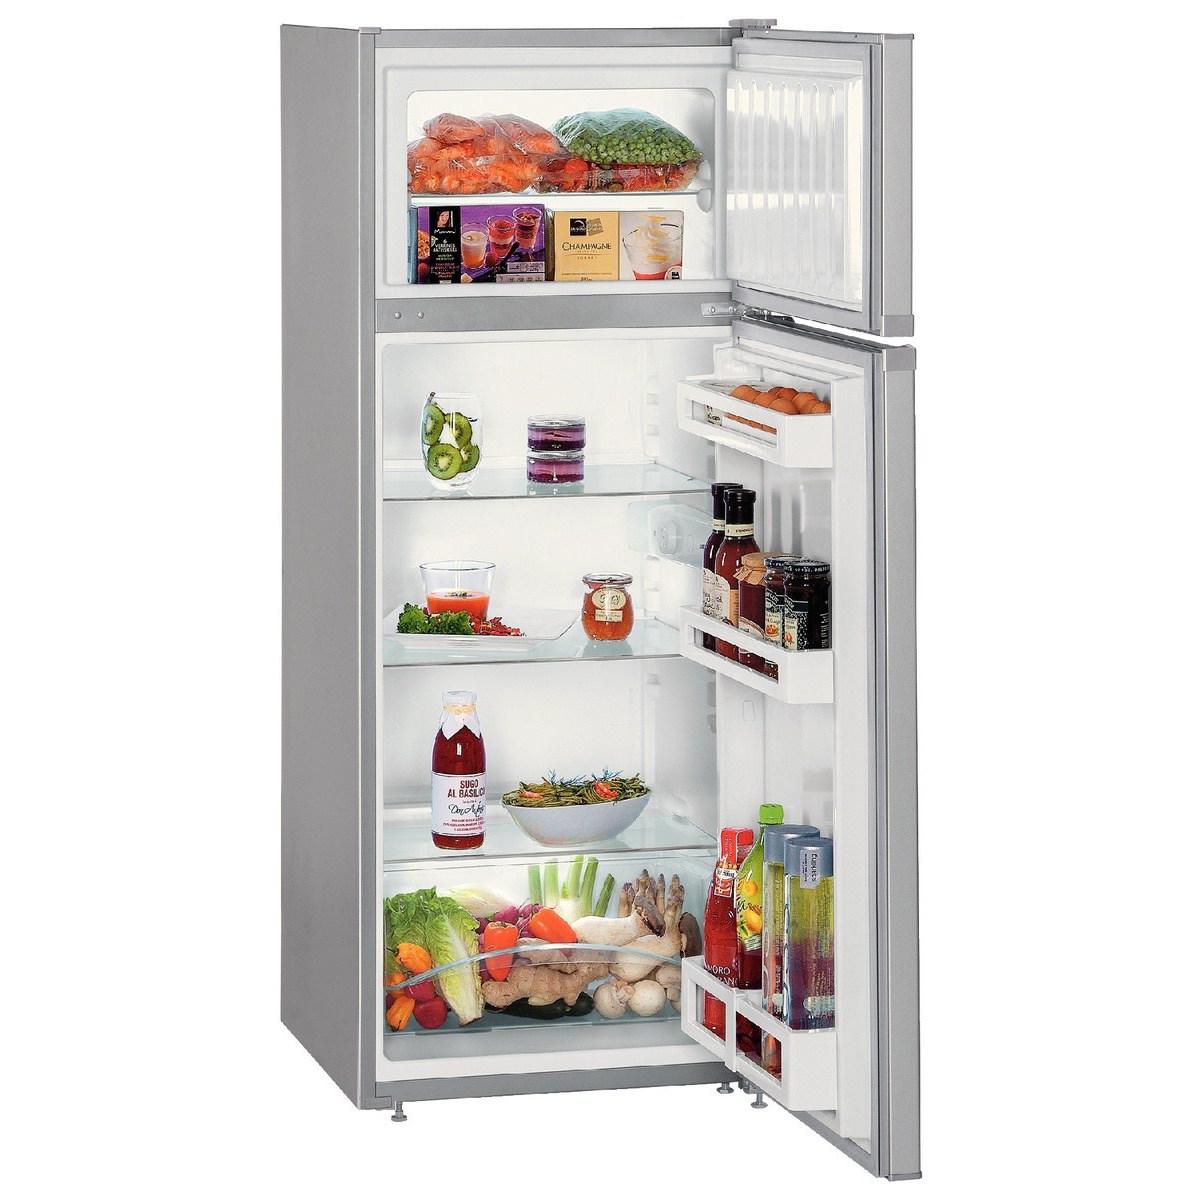 liebherr-ctpsl-2521-comfort-fridge-freezer-silver